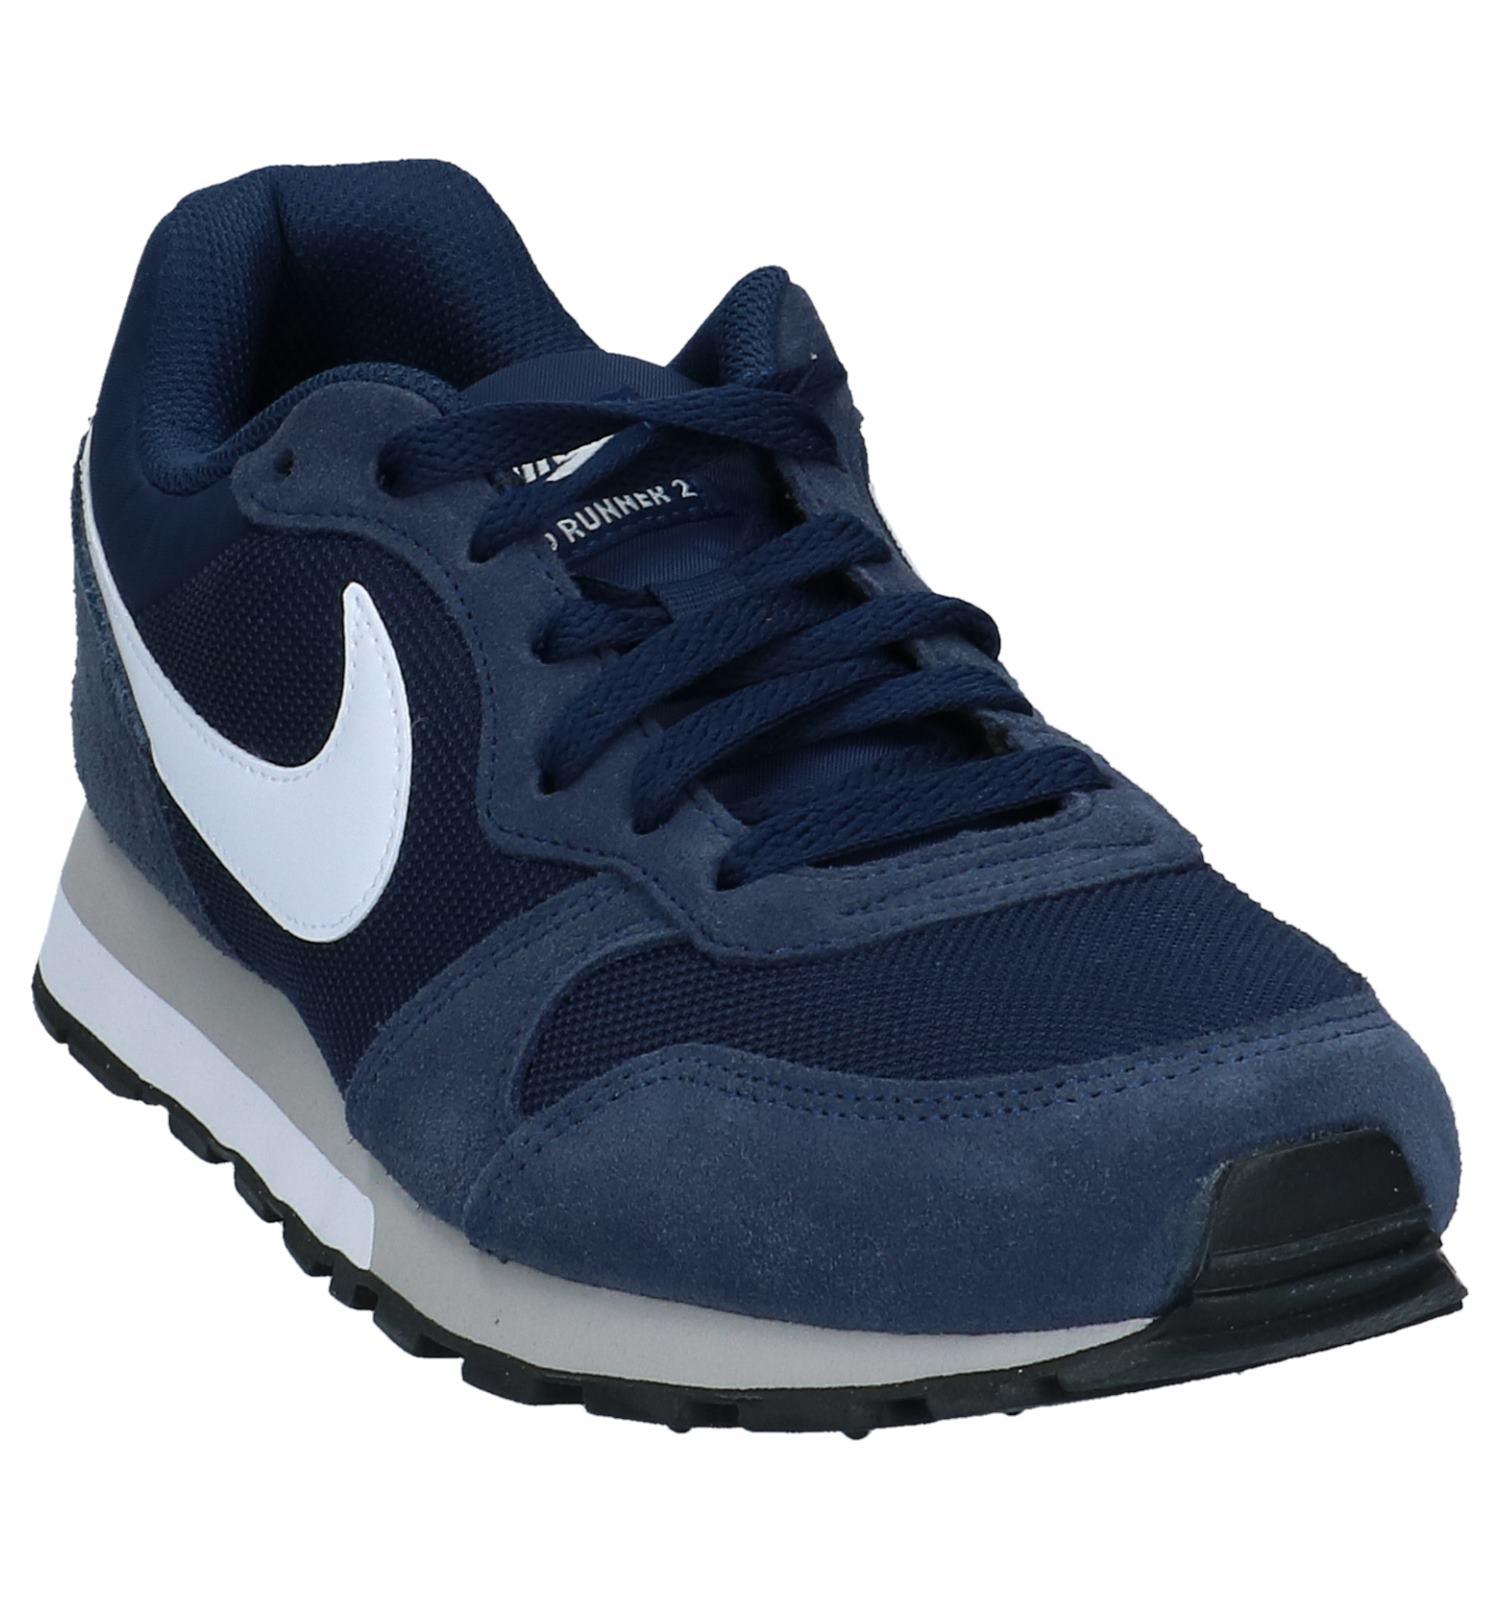 9f985d5fa7b Lage Sportieve Sneakers Donkerblauw Nike MD Runner 2   TORFS.BE   Gratis  verzend en retour